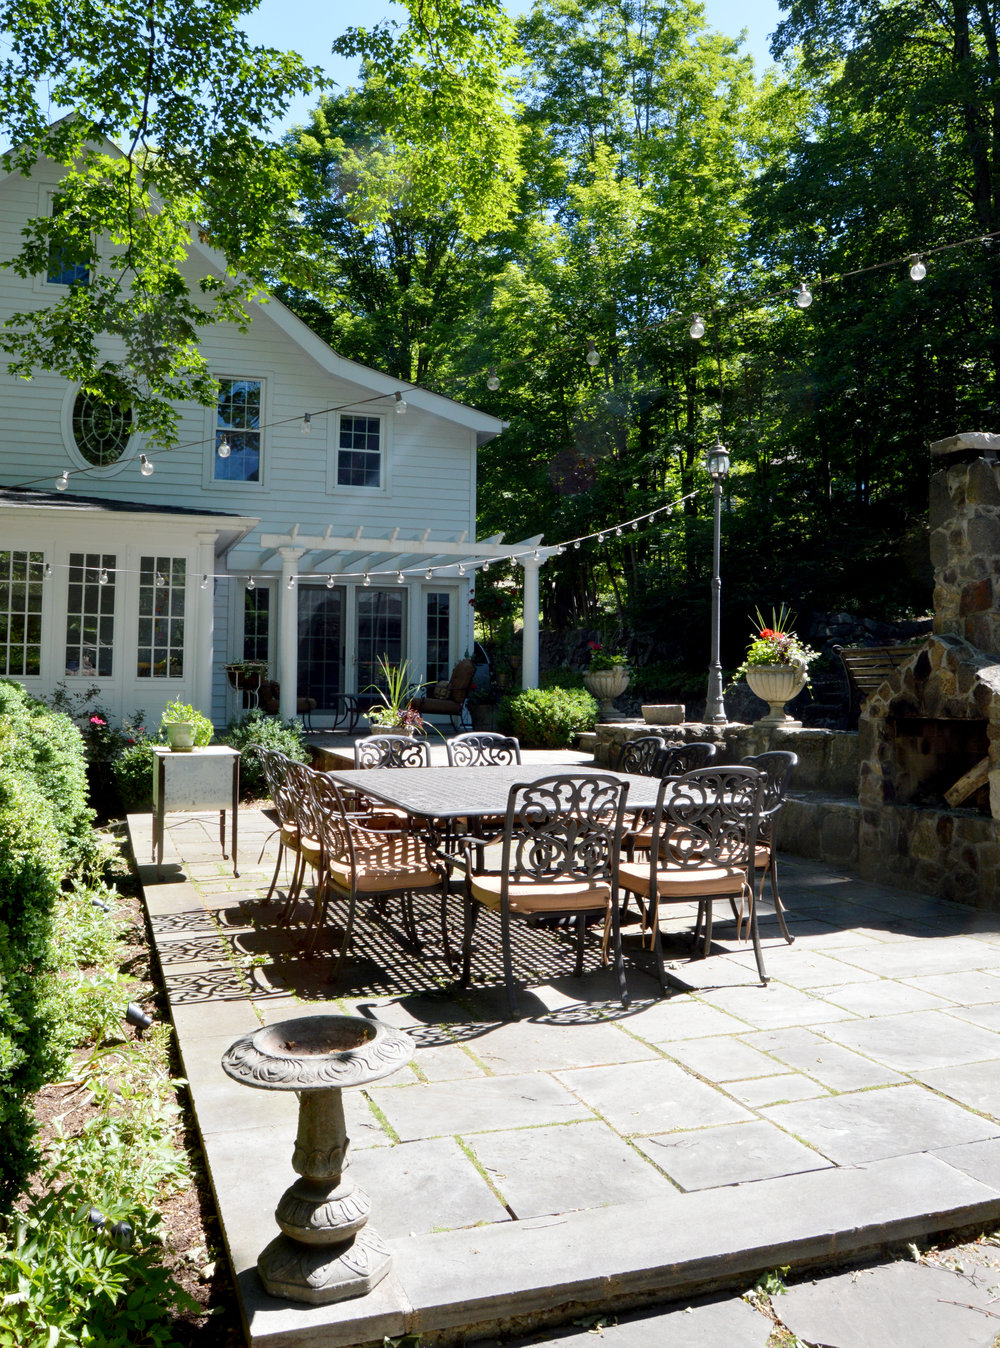 4 Landscaping Ideas for a Wonderful Backyard Retreat in Somers, NY - 4 Landscaping Ideas For A Wonderful Backyard Retreat In Somers, NY